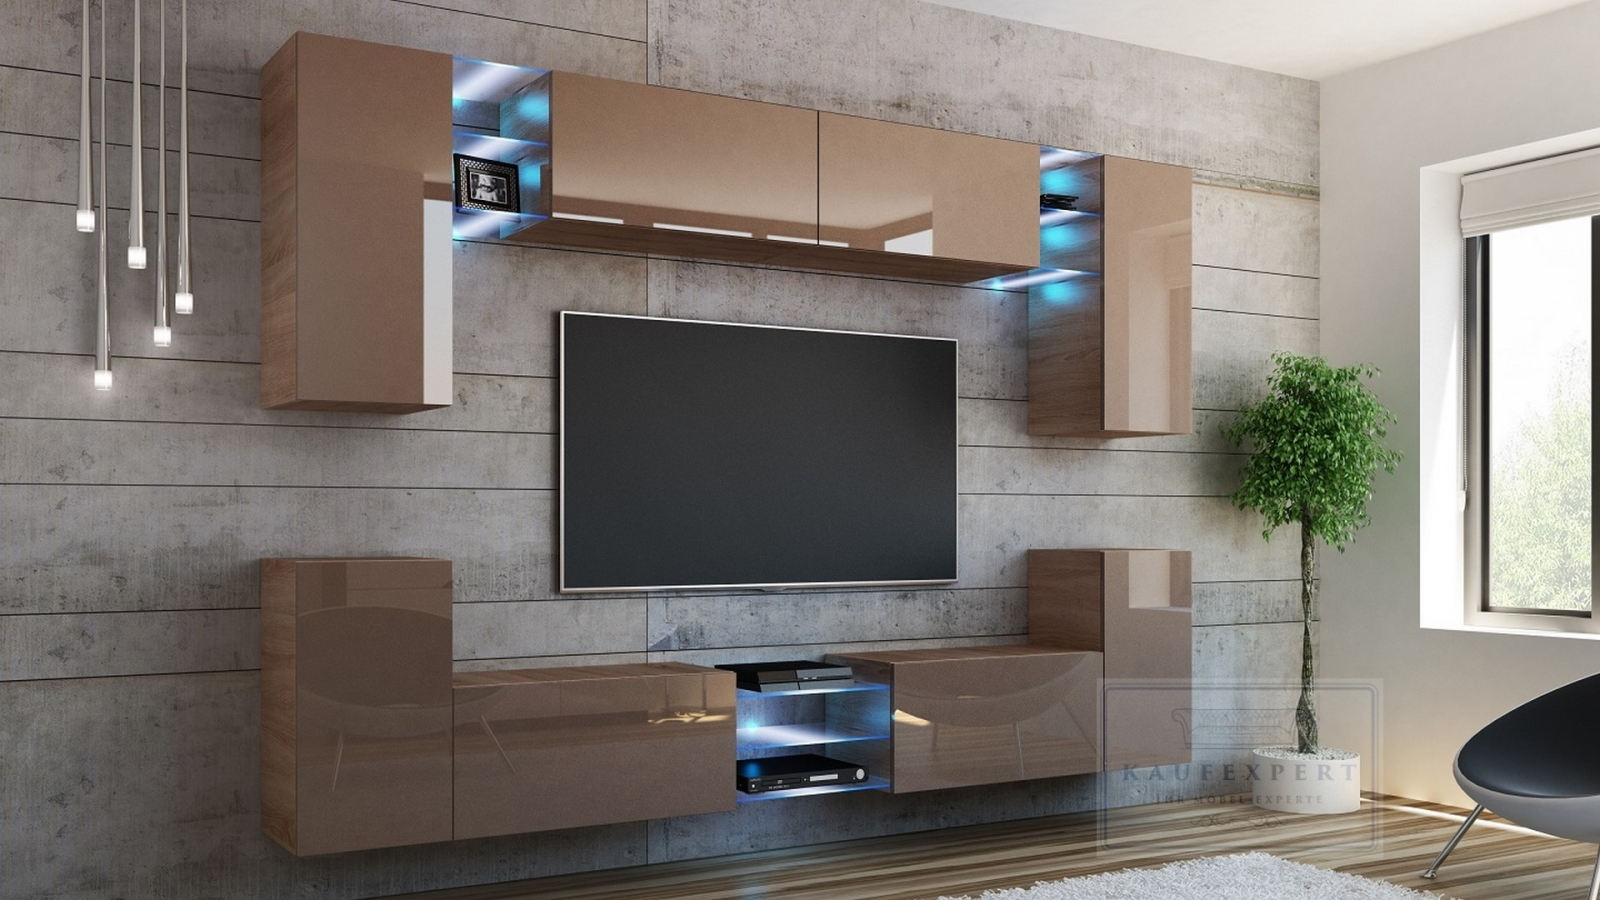 kaufexpert wohnwand galaxy cappuccino hochglanz sonoma eiche mediawand medienwand design. Black Bedroom Furniture Sets. Home Design Ideas